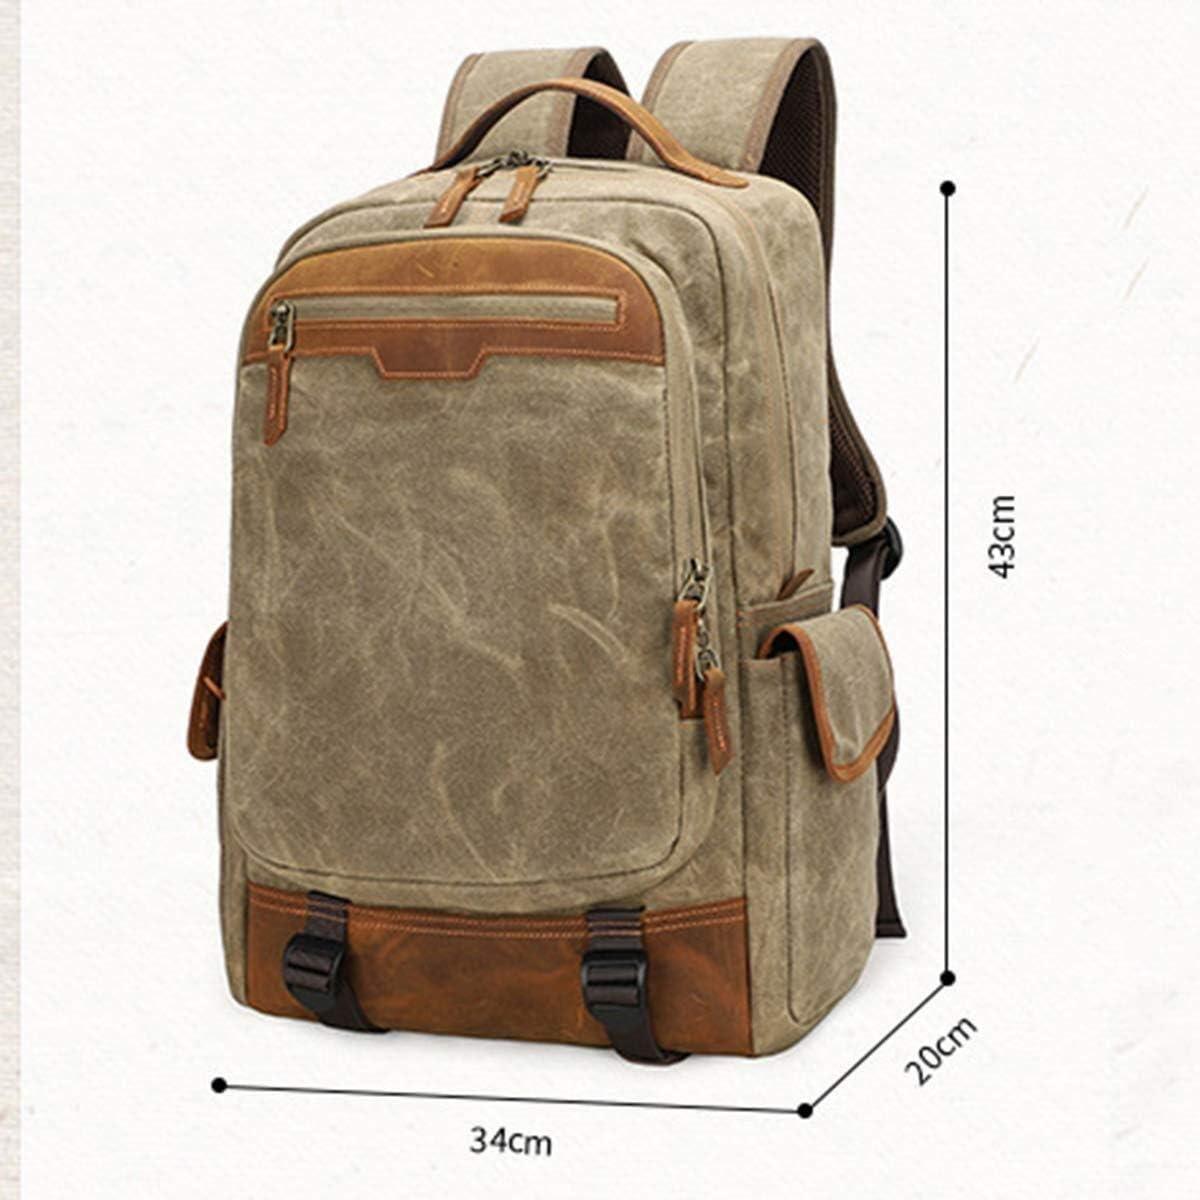 Yikuo Dark Grey Photo Backpack Outdoor Canvas Bag SLR Bag Camera Backpack //34 X 20 X 43 cm Breathable